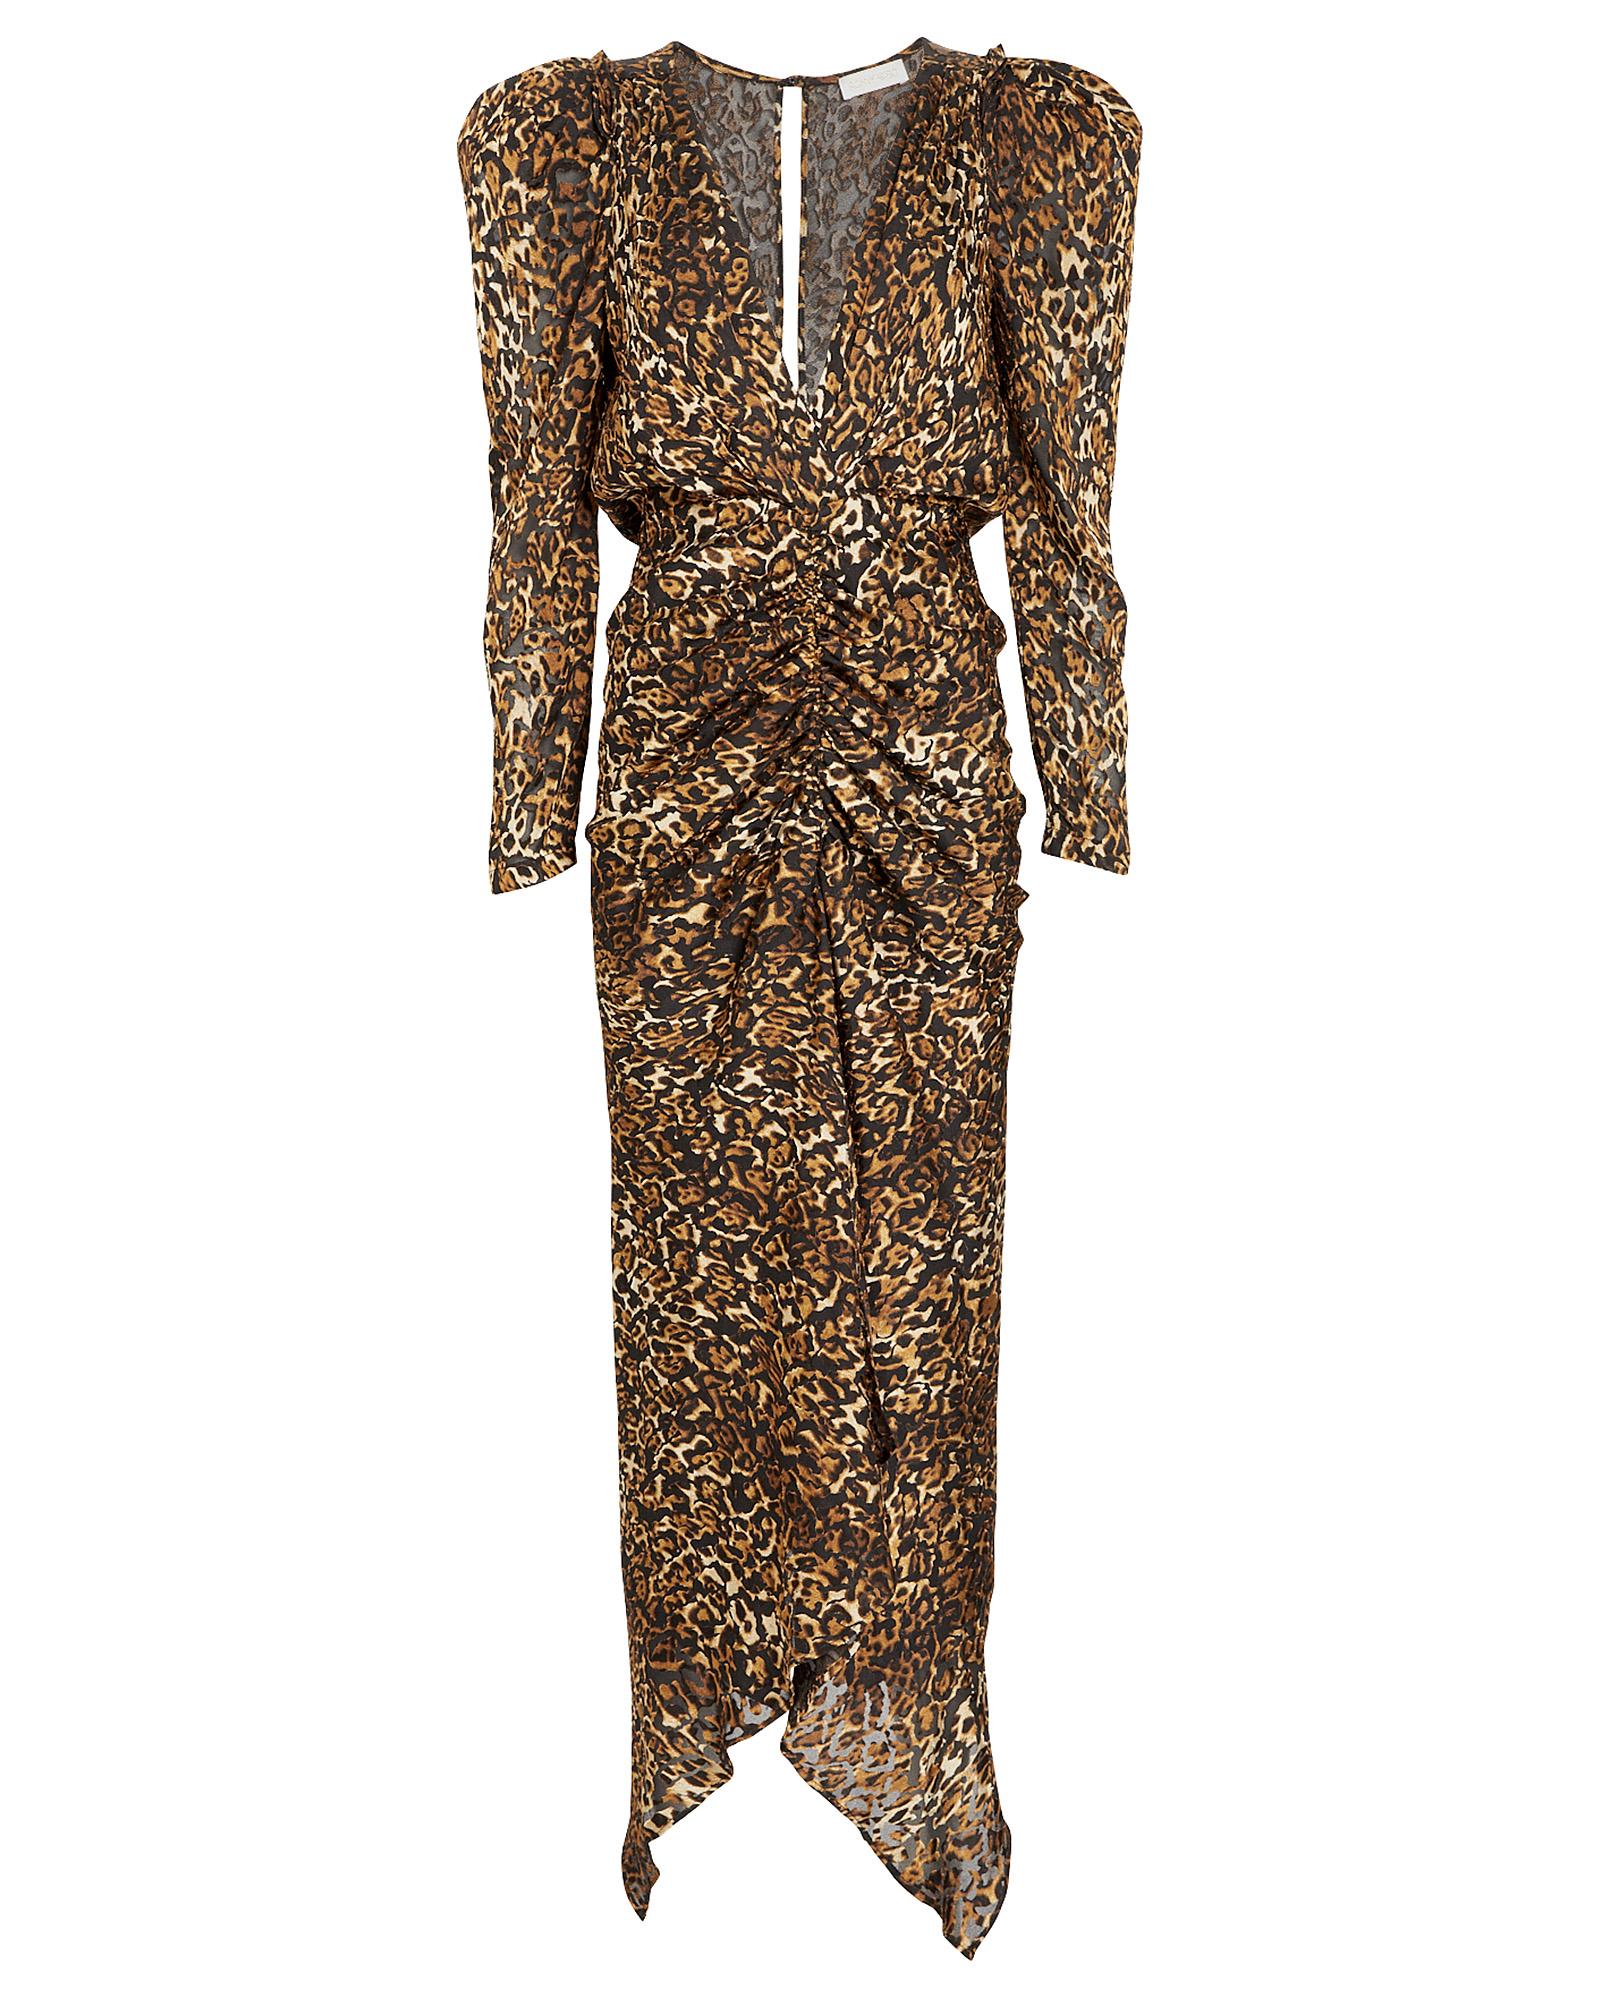 Ronny Kobo Dresses Astrid Leopard Burnout Dress